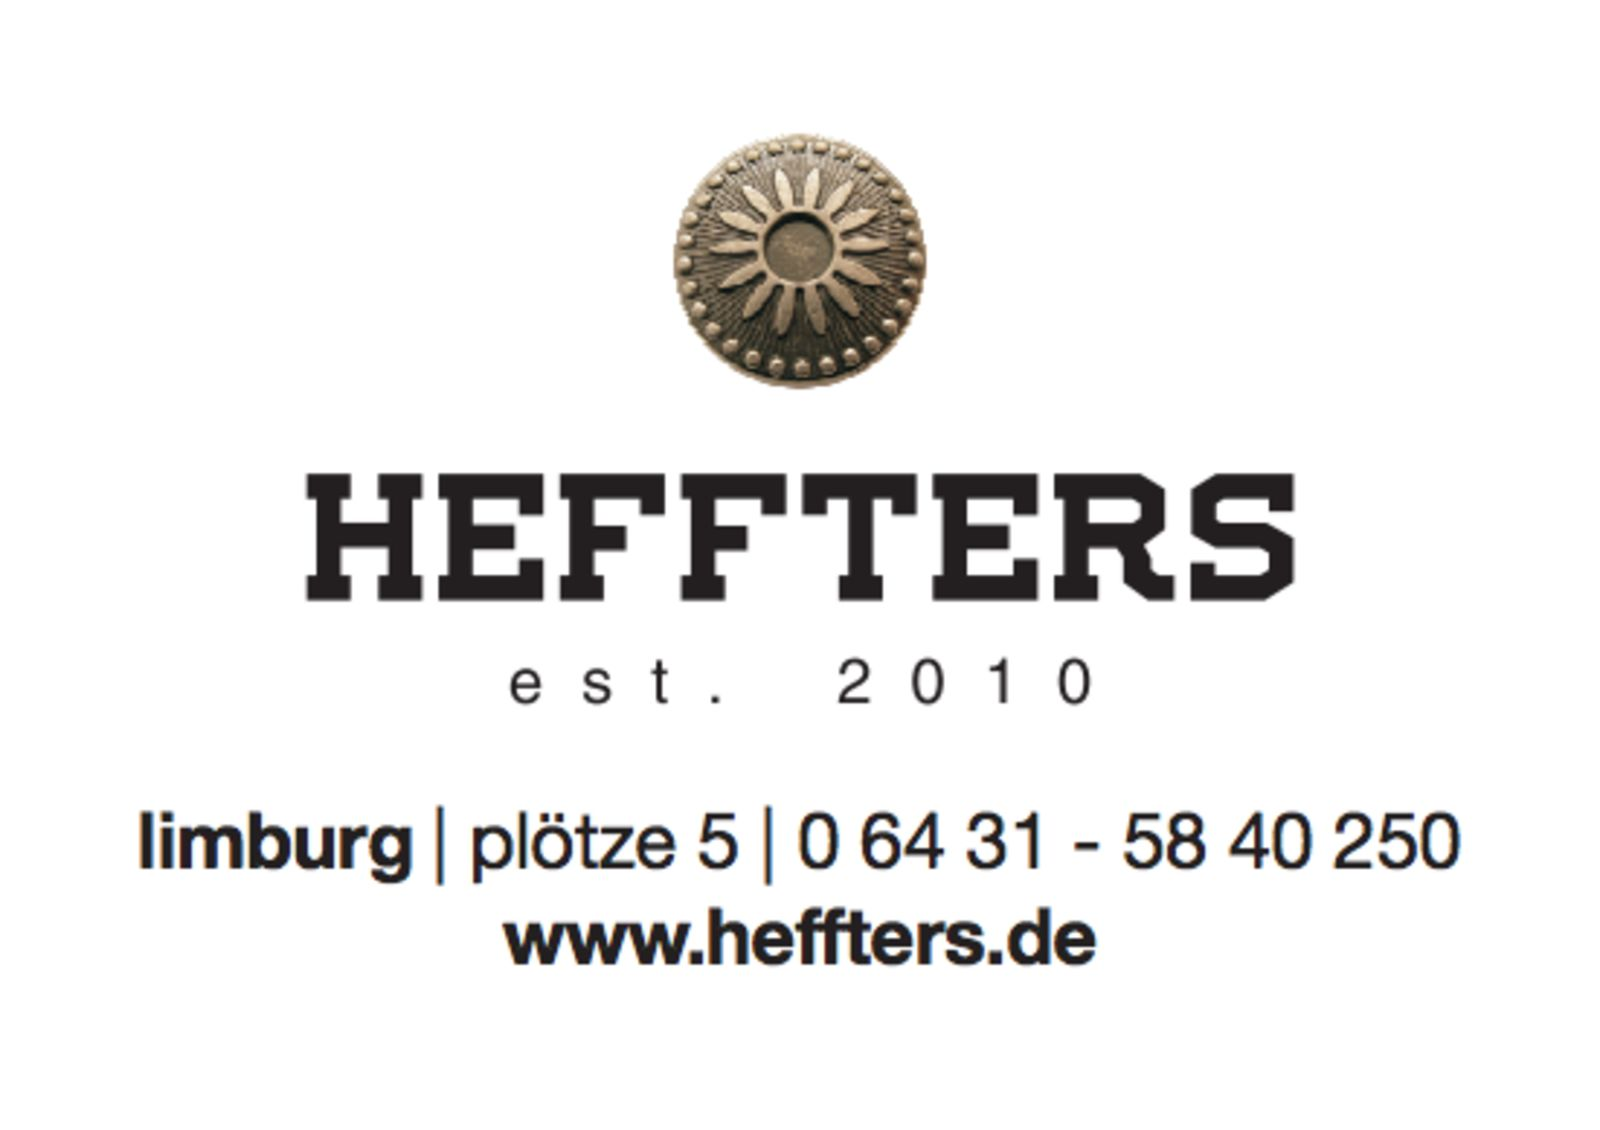 Heffters in Limburg an der Lahn (Bild 1)